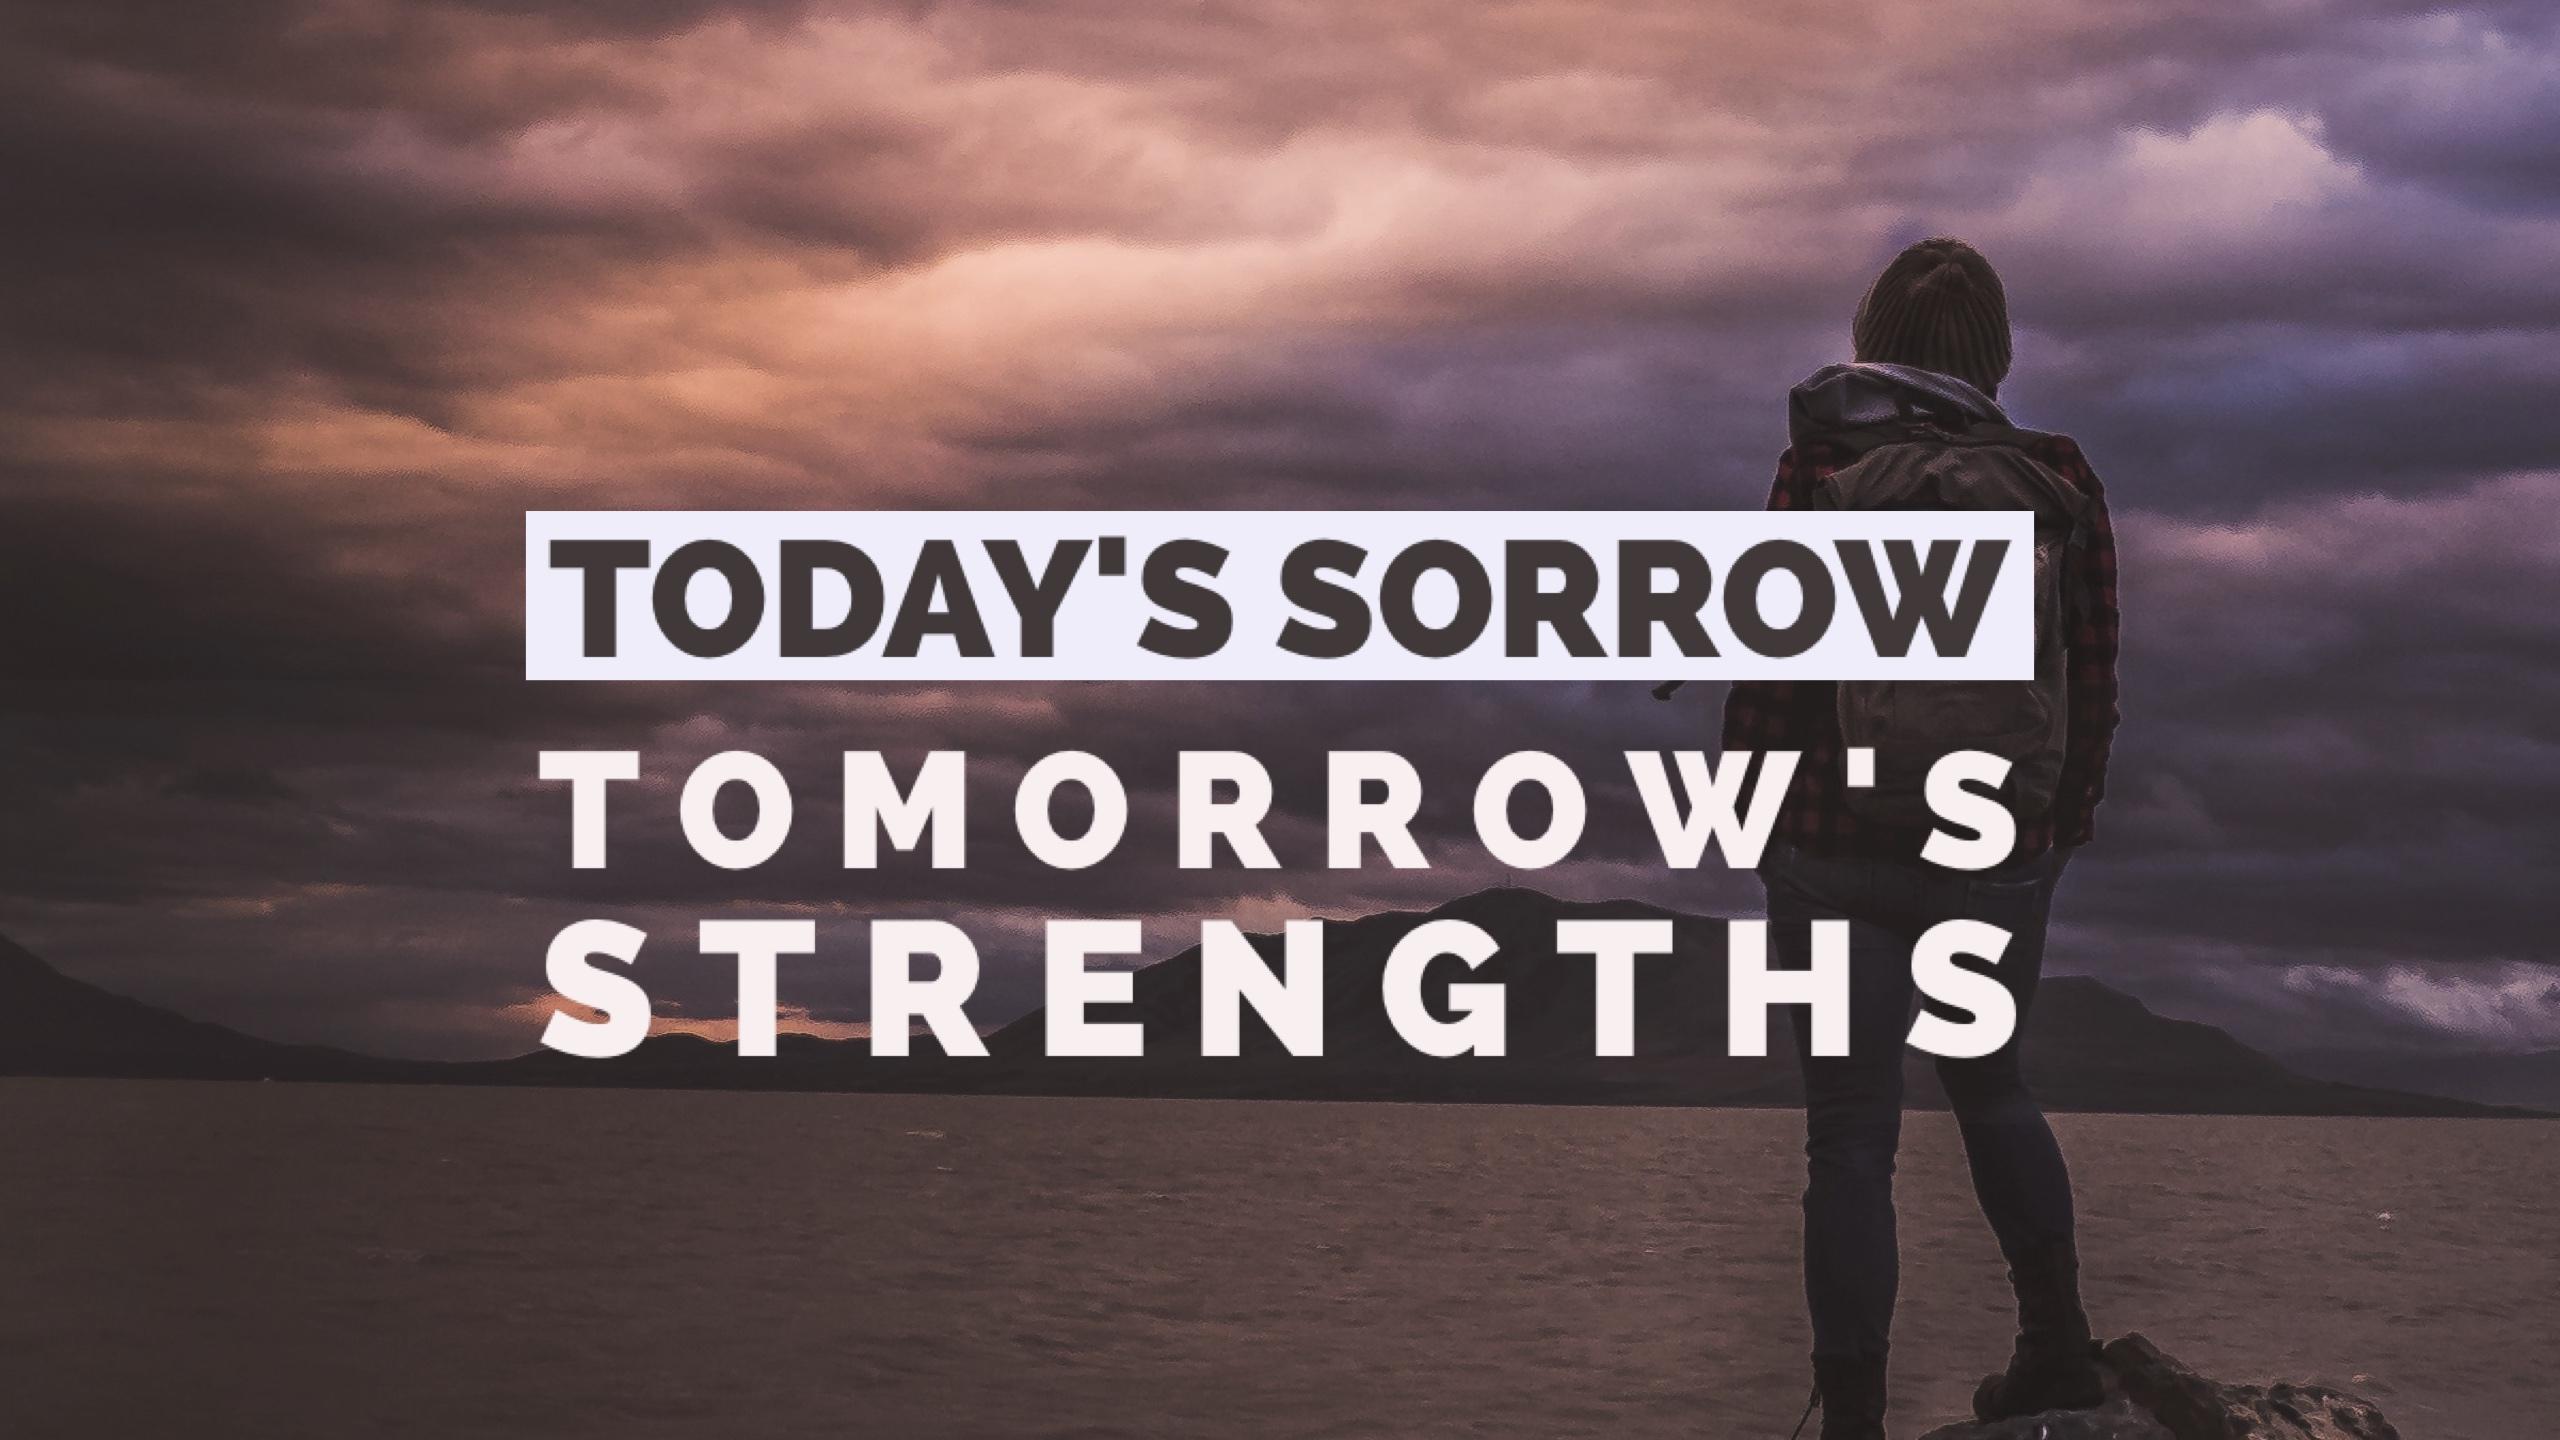 Today's Sorrows, Tomorrow's Strengths